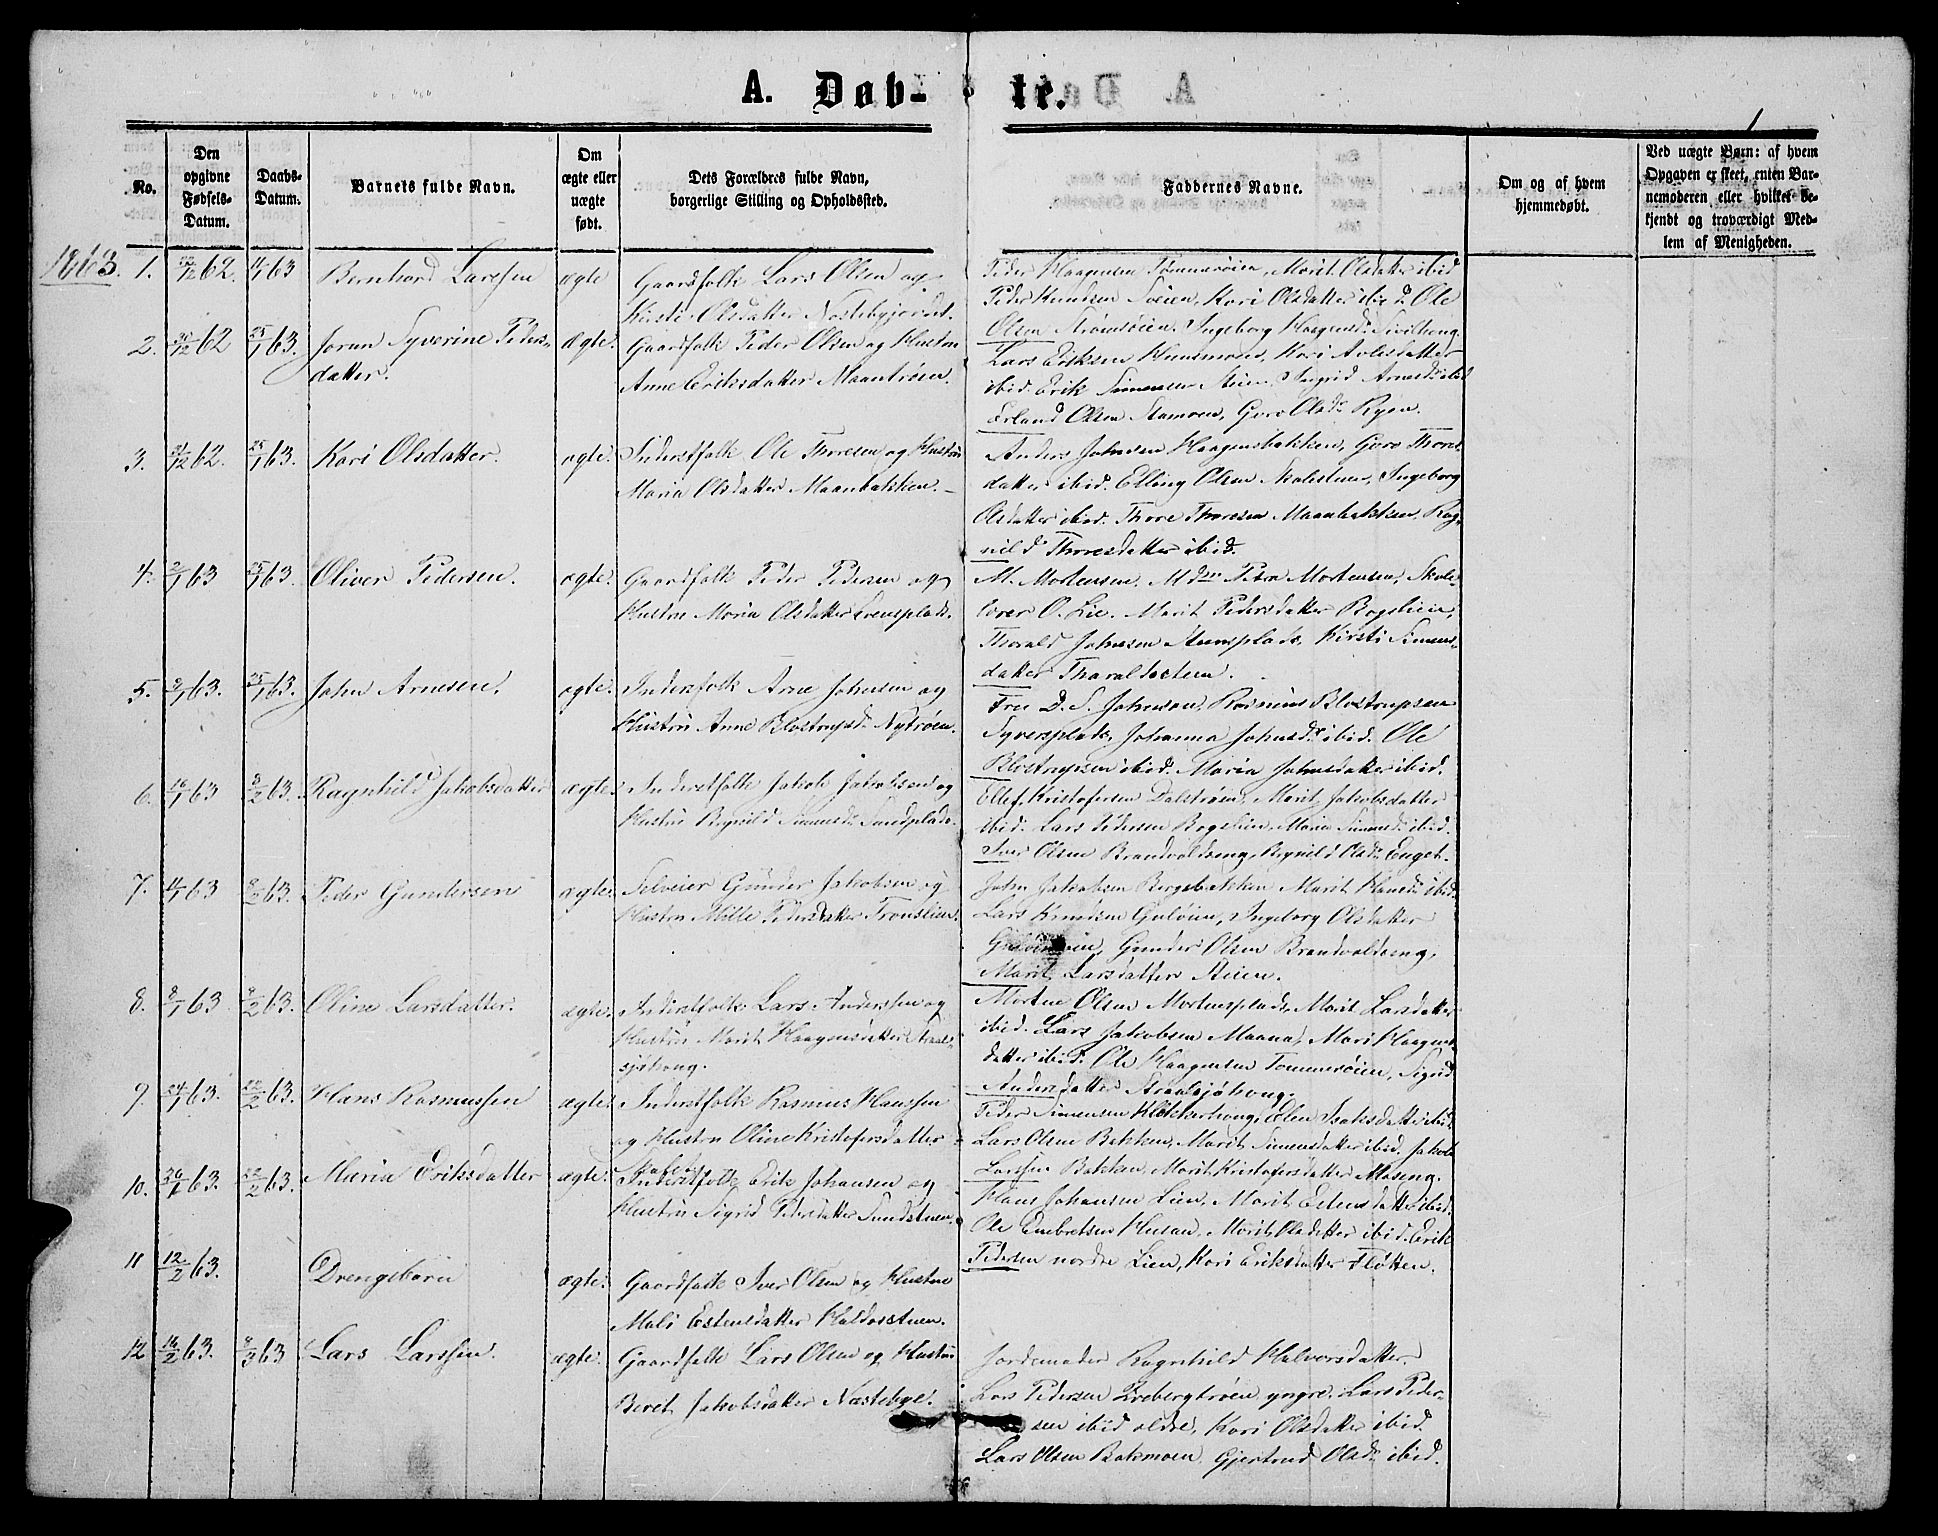 SAH, Alvdal prestekontor, Klokkerbok nr. 2, 1863-1878, s. 1